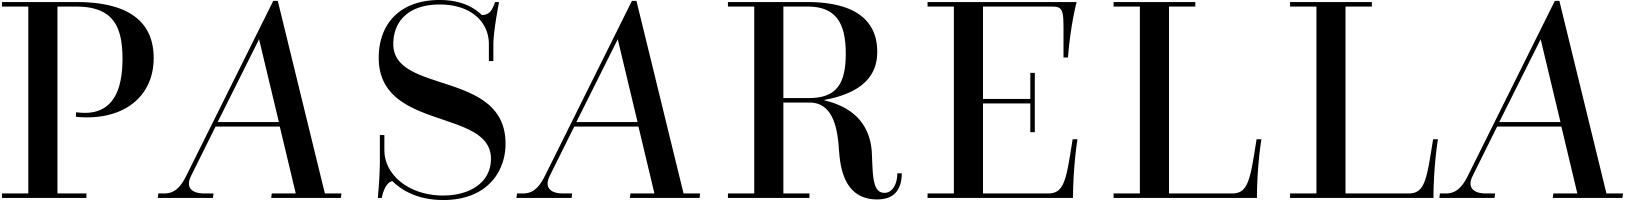 Logo Pasarella